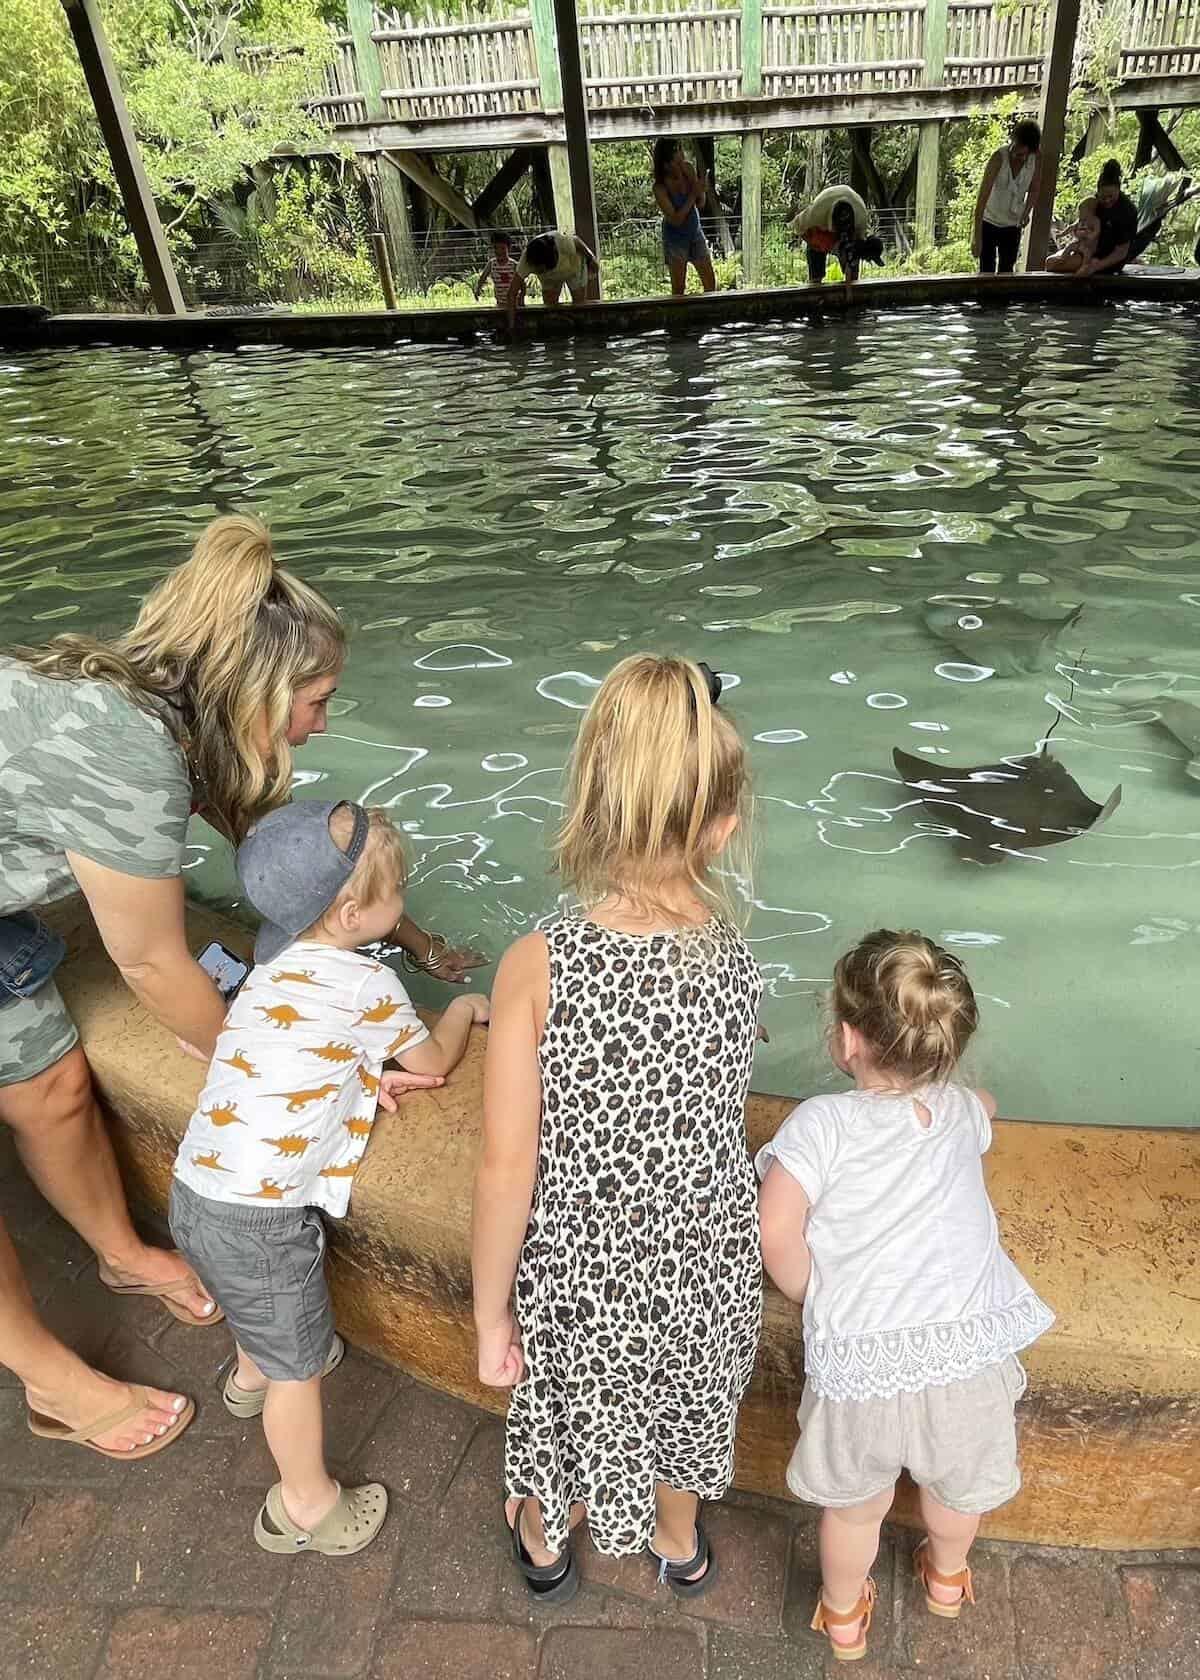 stingray bay at jacksonville zoo and gardens